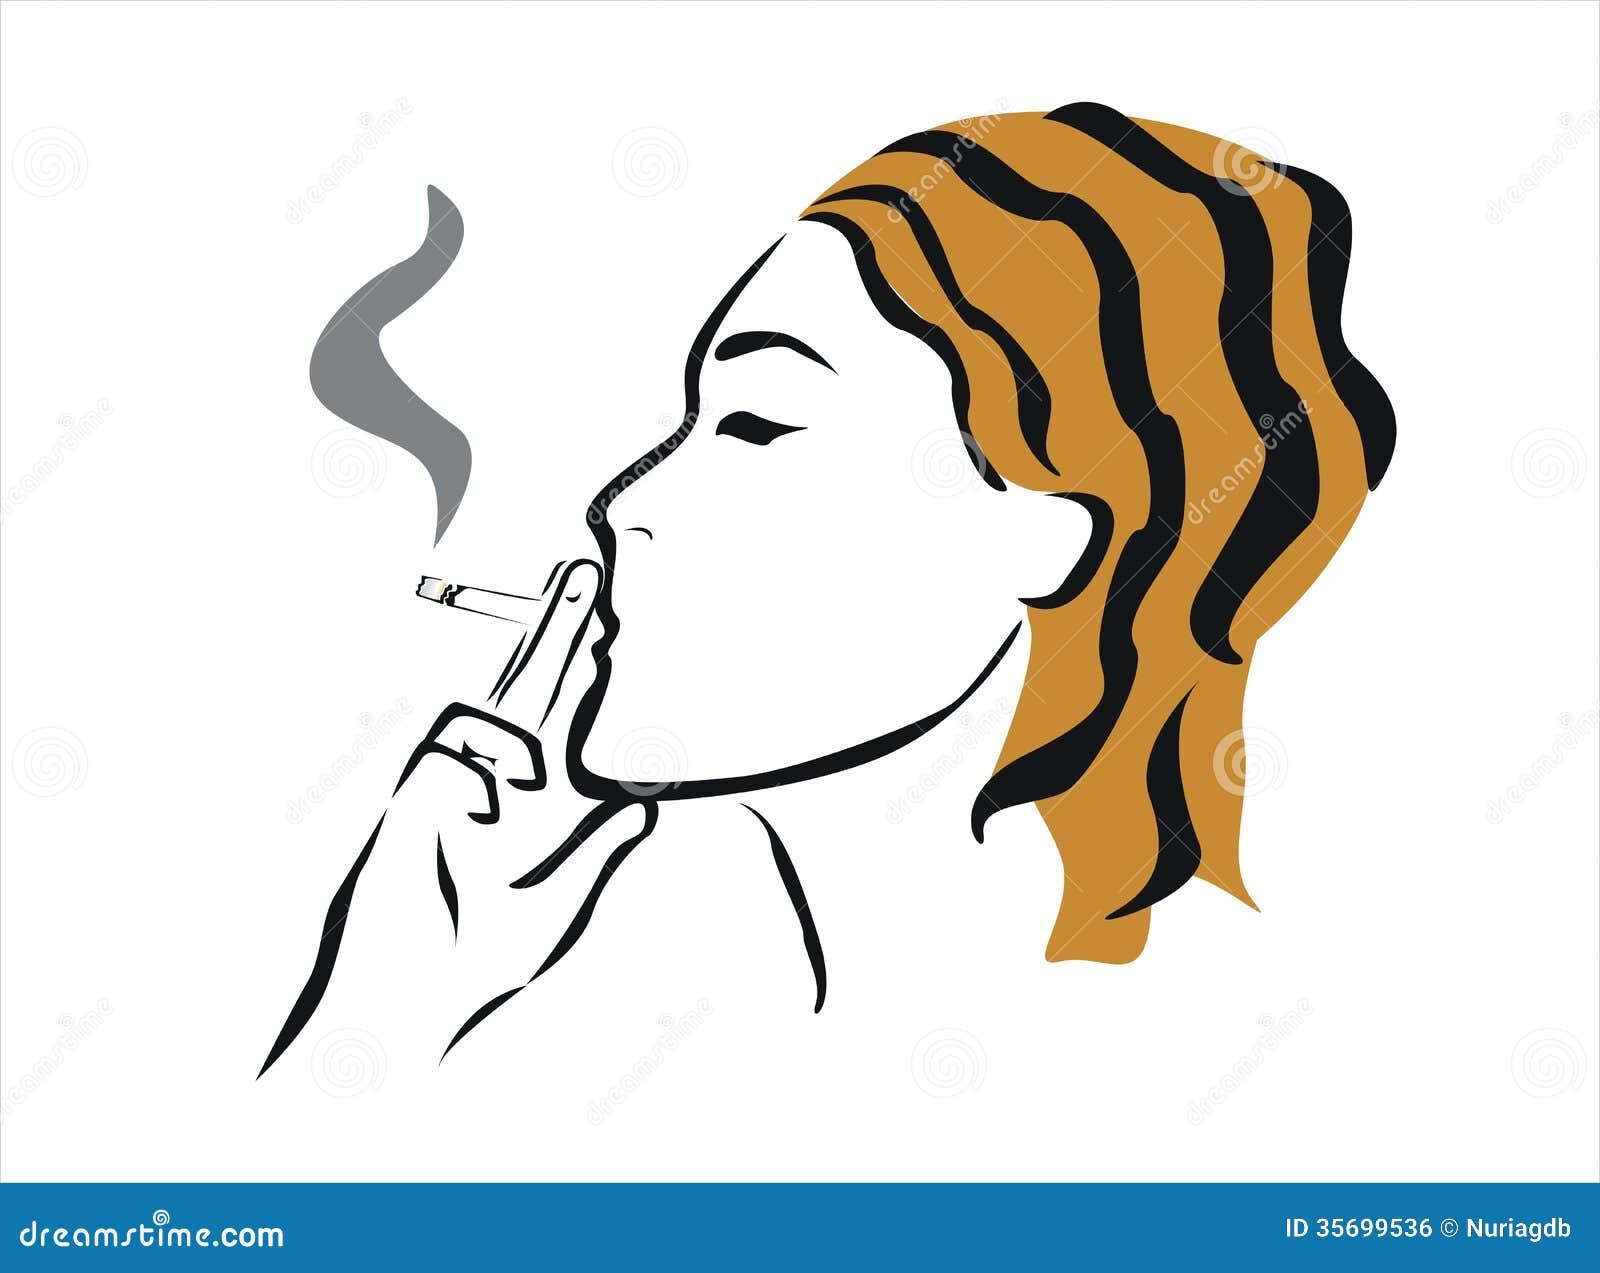 drawings of naked girl smoking